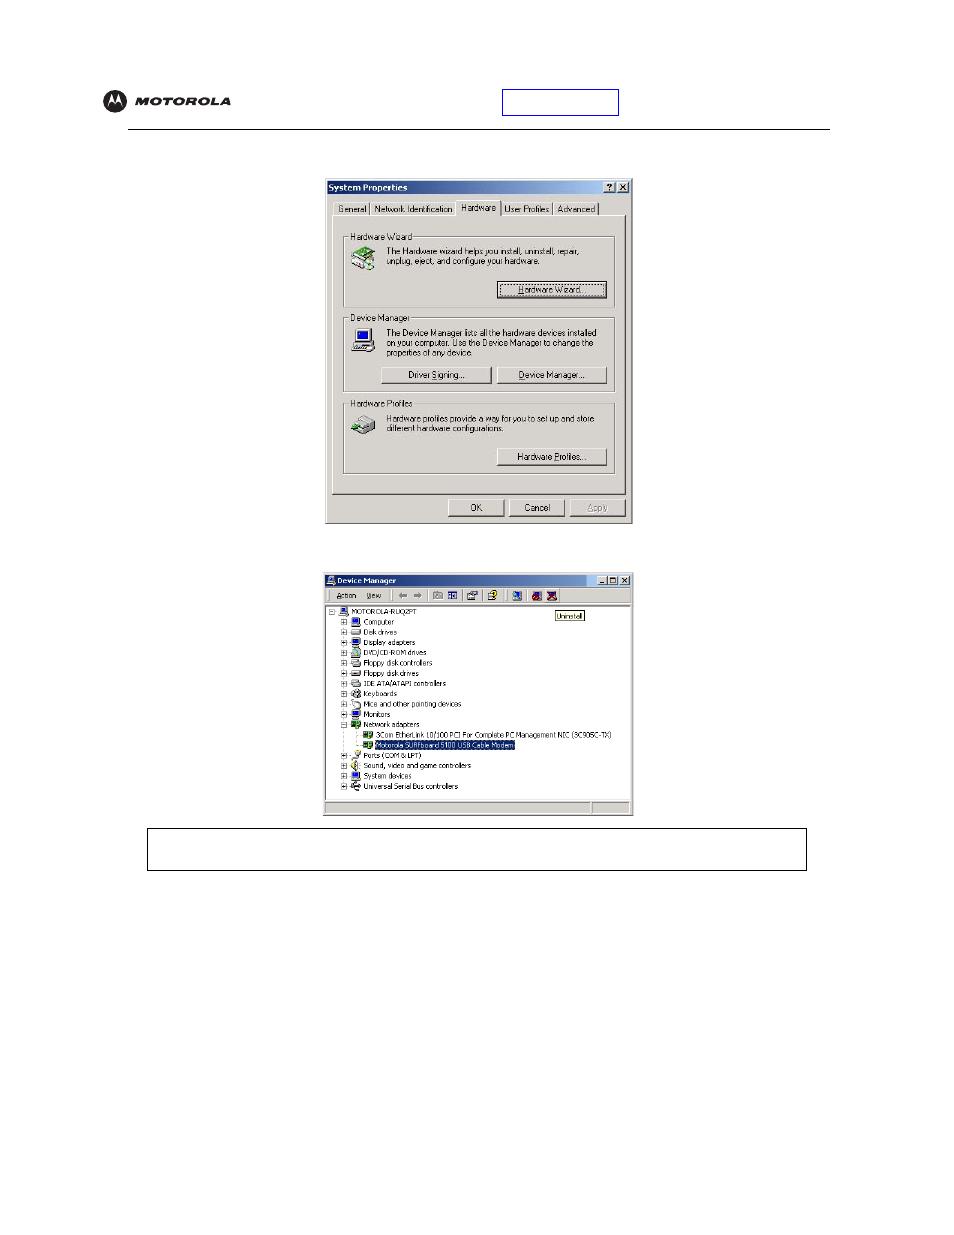 Motorola sbv5121 manuals.